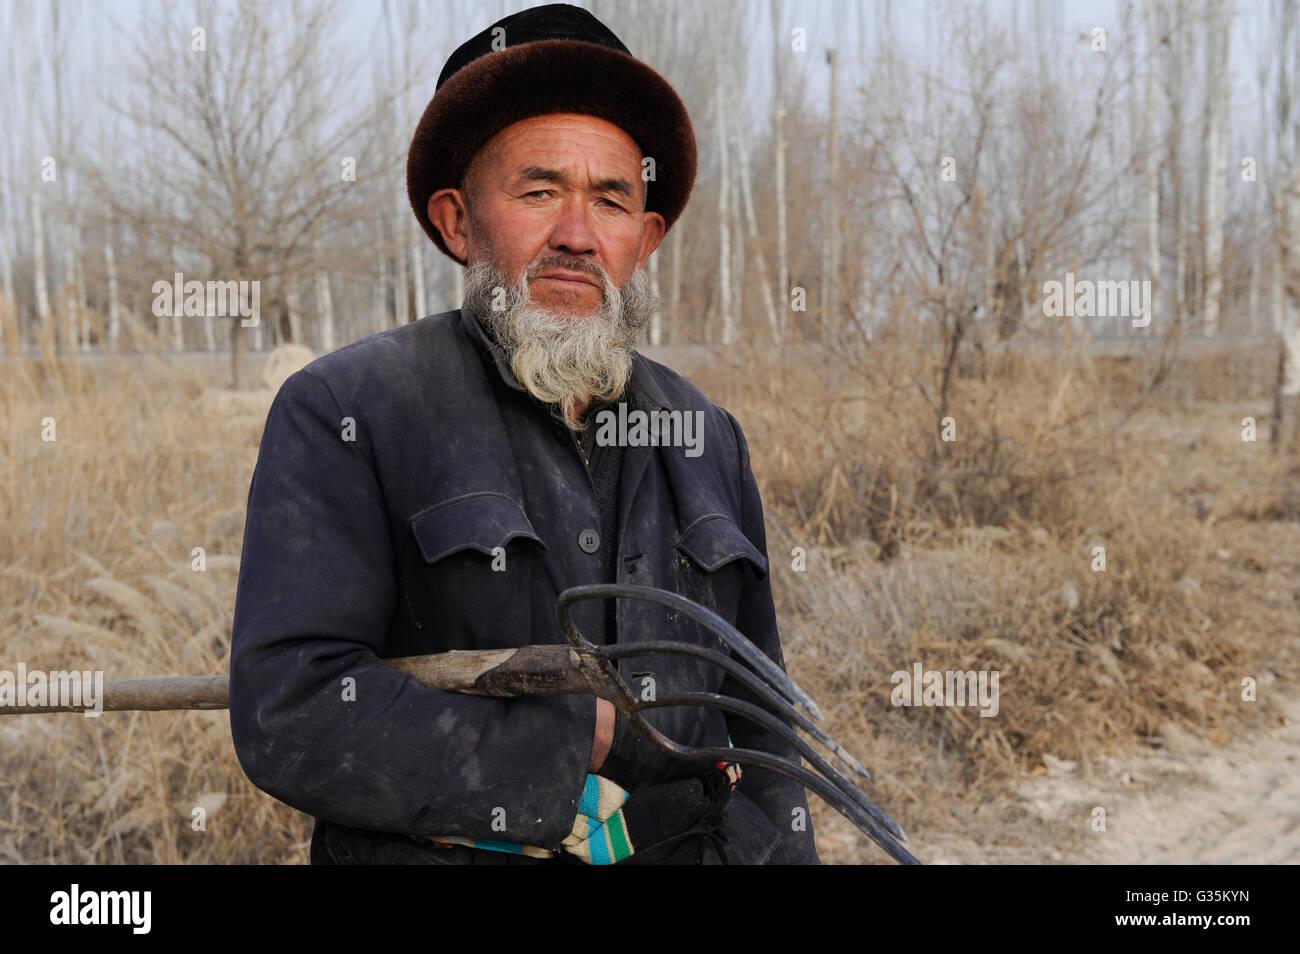 CHINA province Xinjiang Kashgar , uyghur farmer with fork during winter - Stock Image